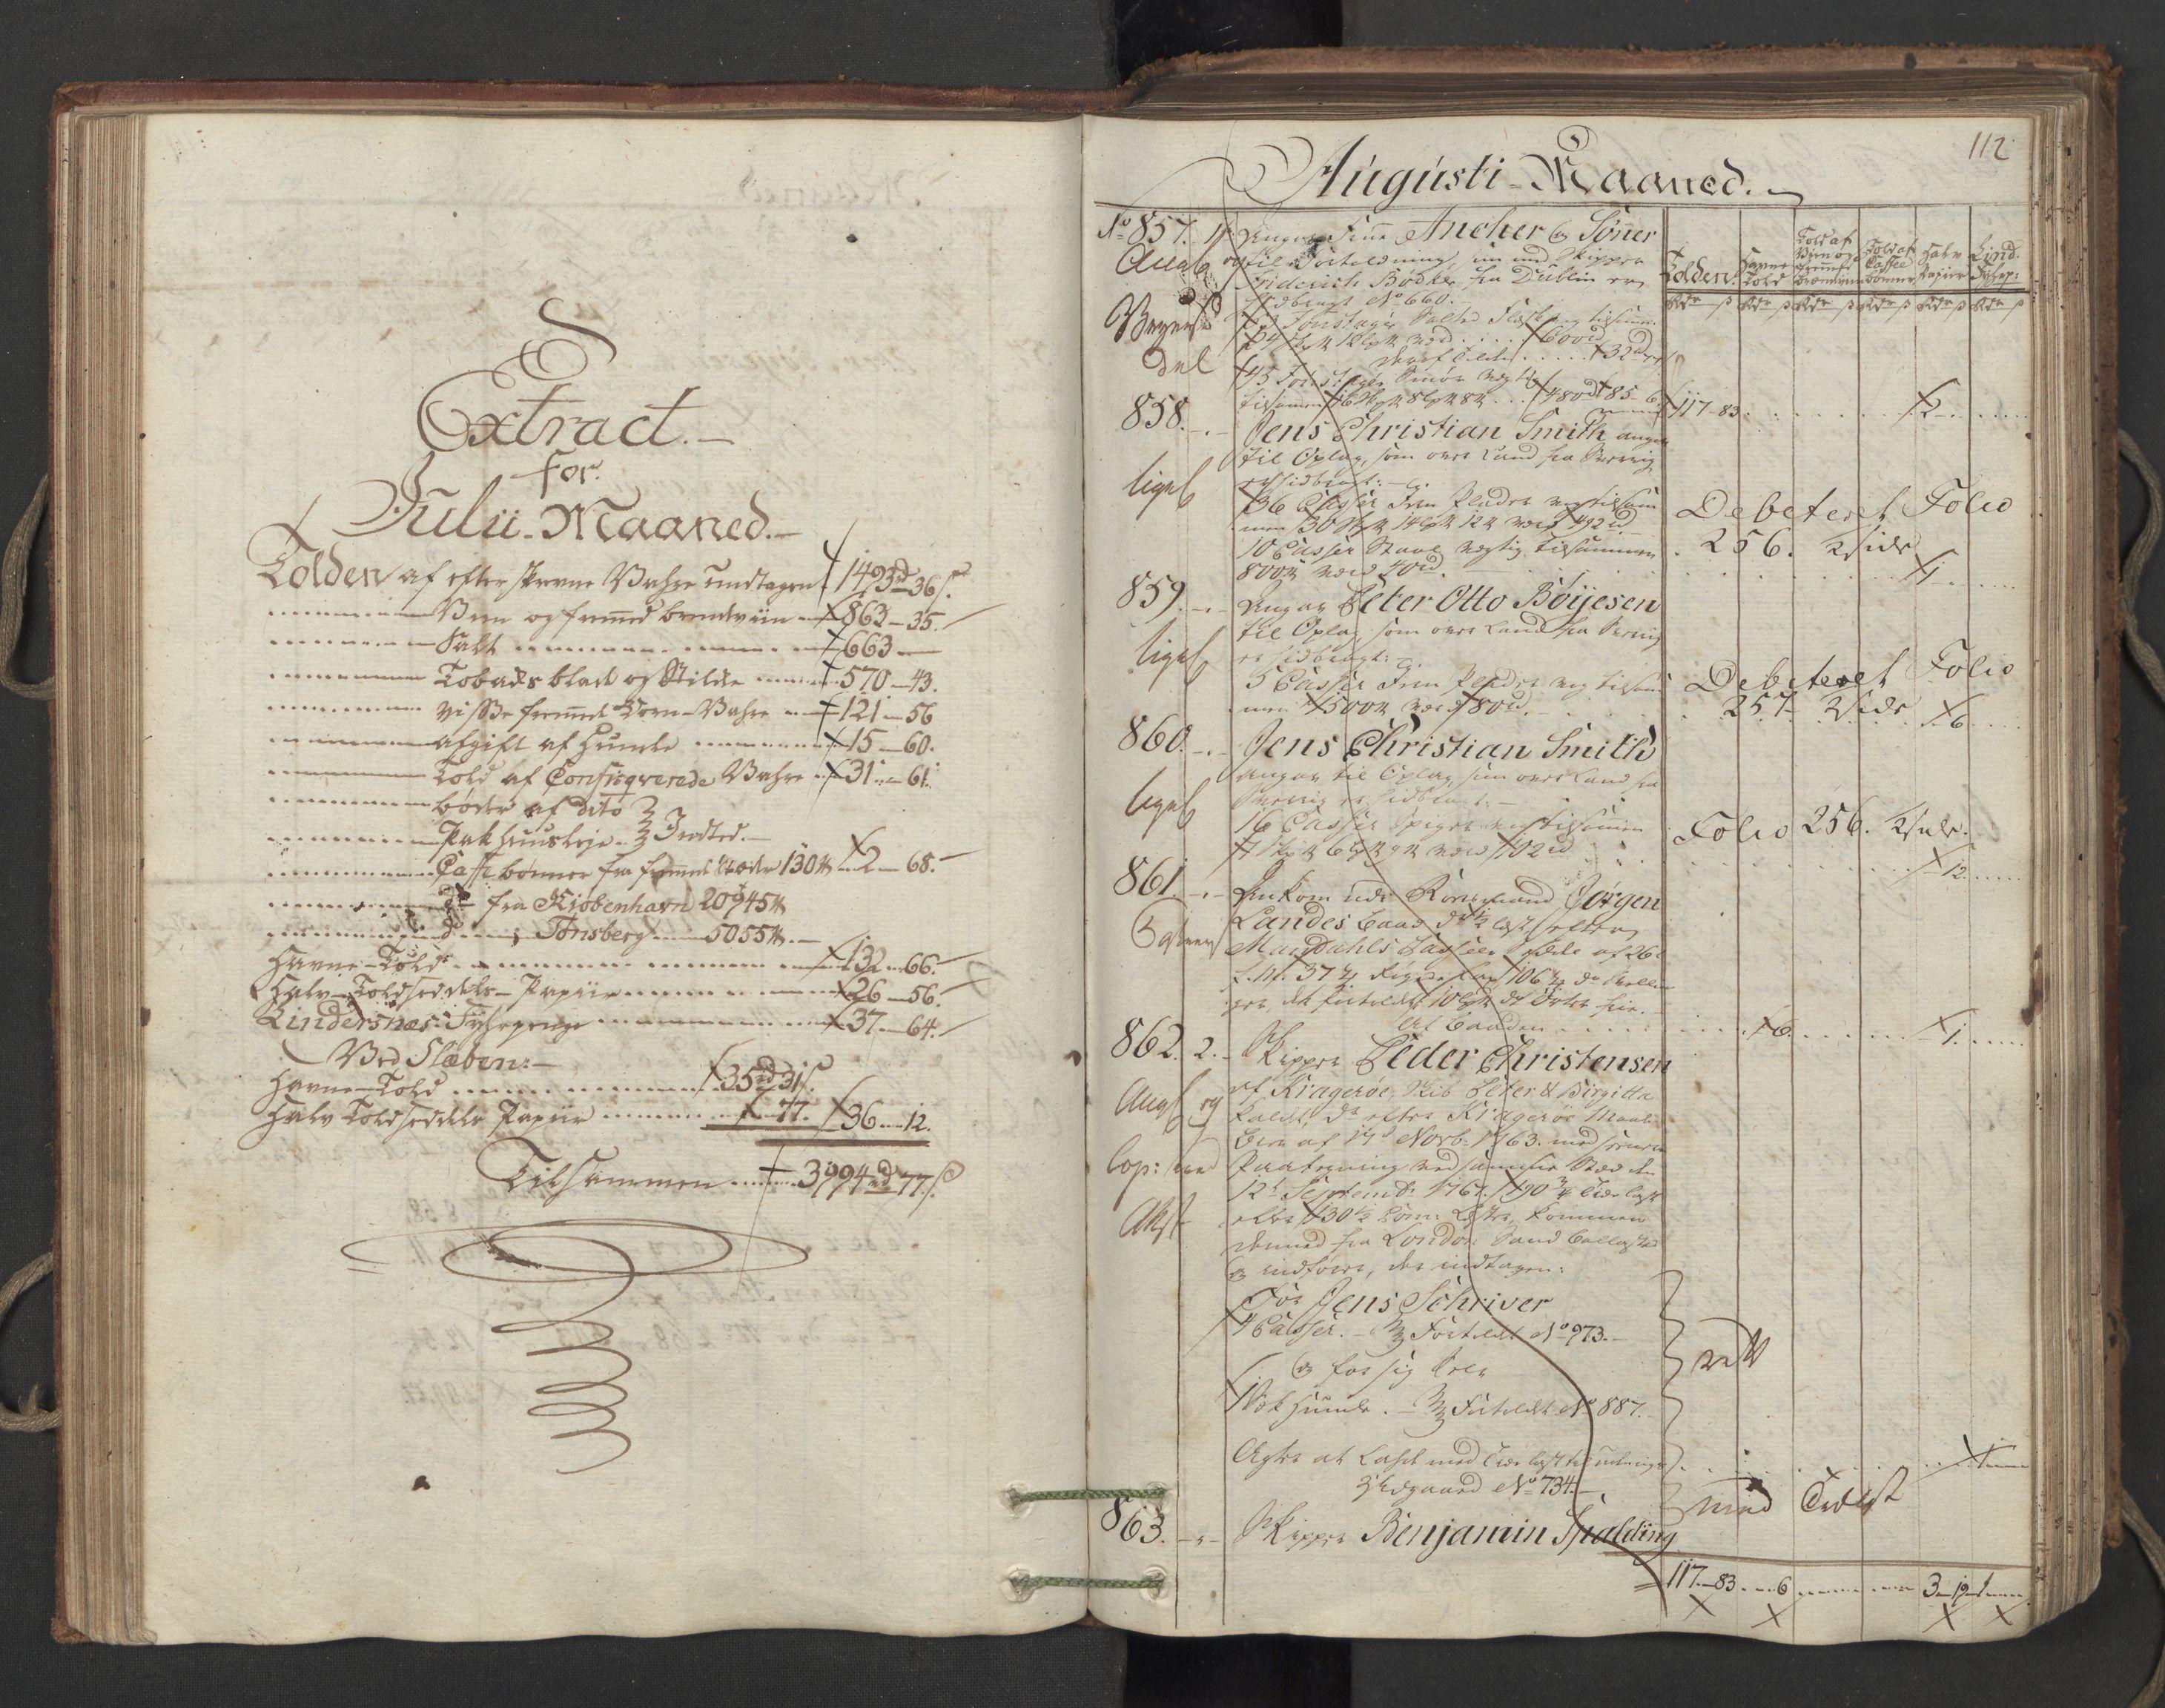 RA, Generaltollkammeret, tollregnskaper, R06/L0173: Tollregnskaper Kristiania, 1788, s. 111b-112a